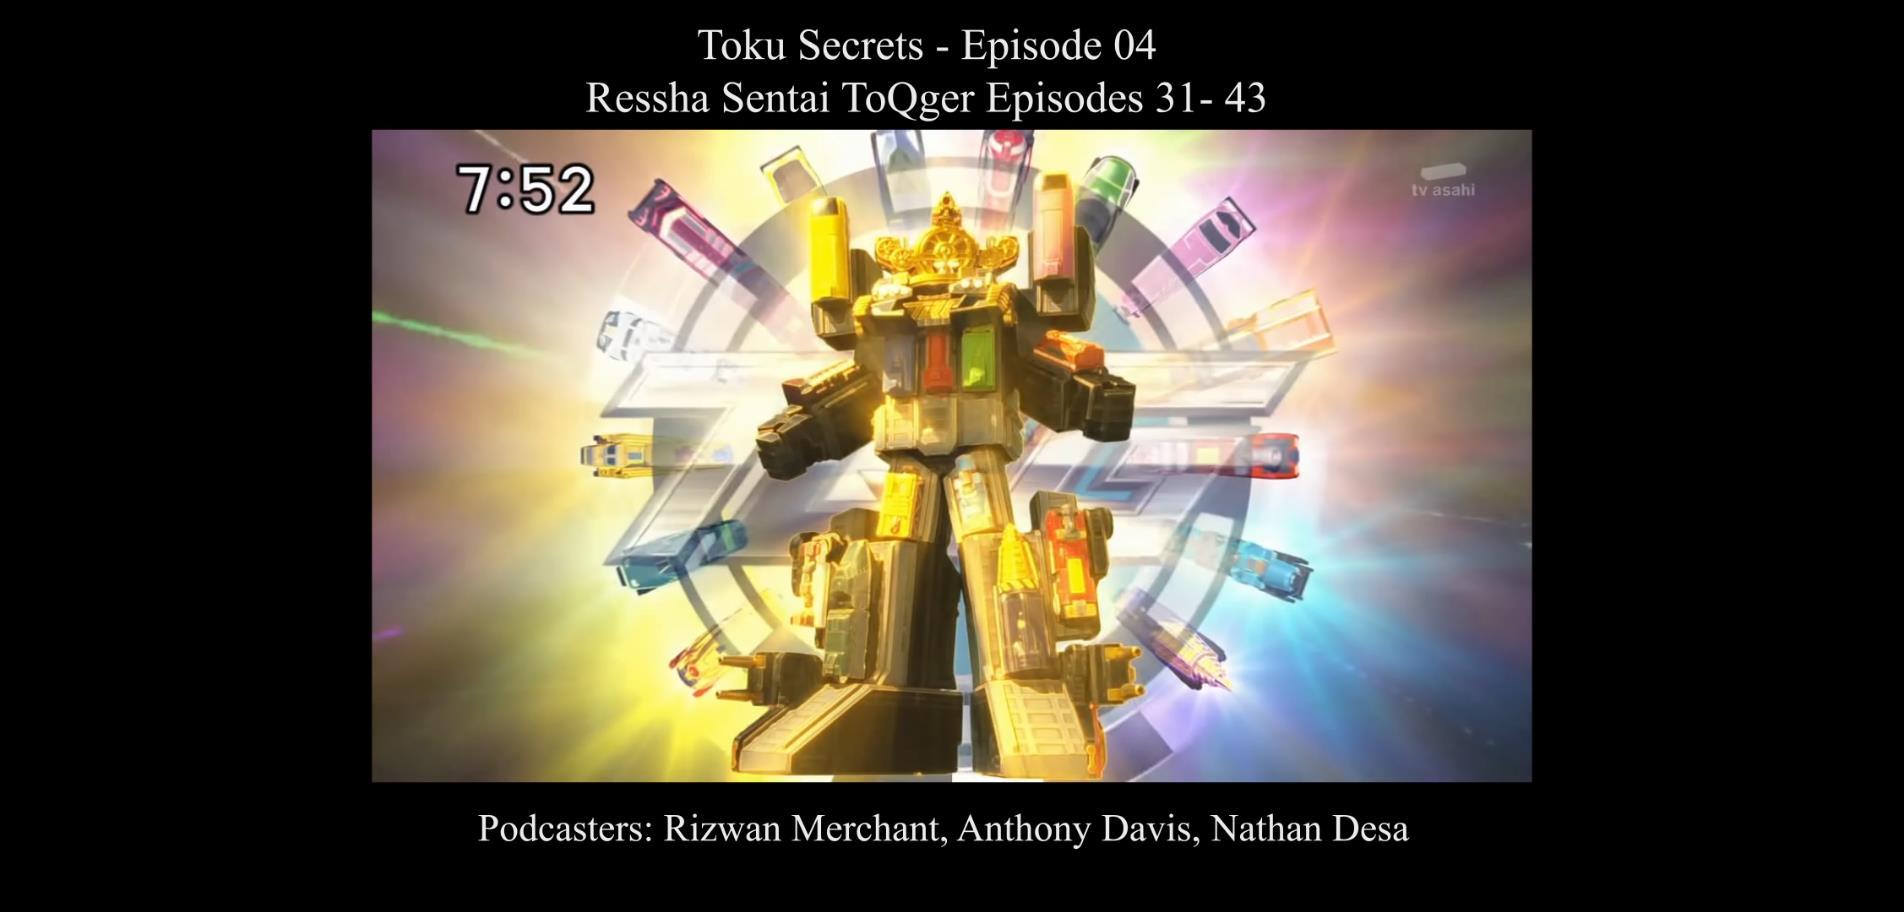 Toku Secrets Podcast: Episode 04 – Ressha Sentai ToQger Part 4